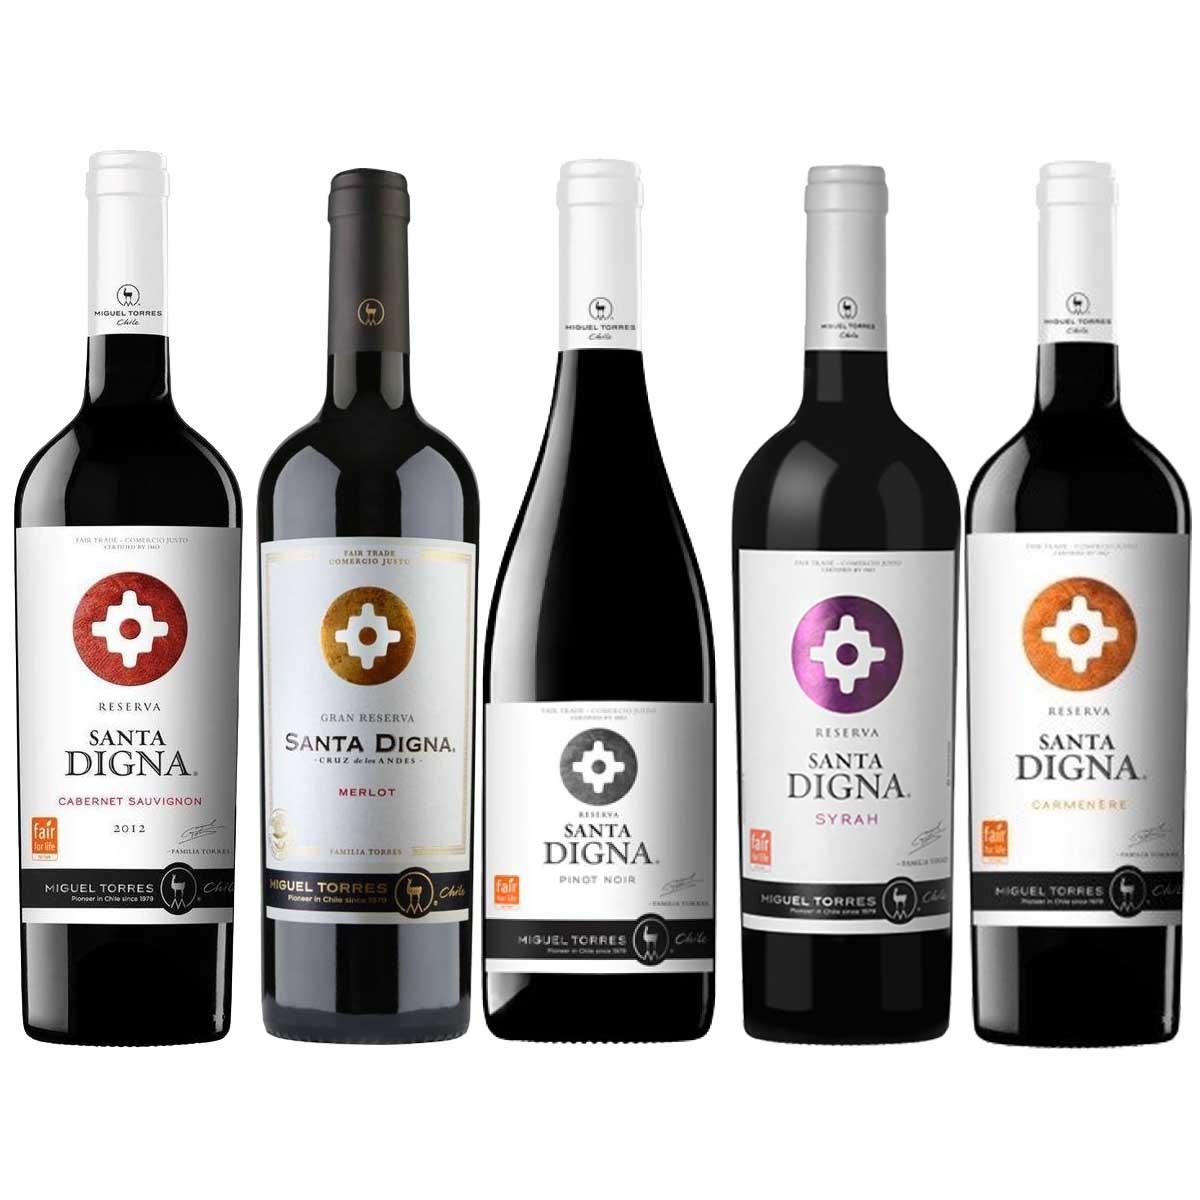 Kit 5 vinhos Tintos Santa Digna Chileno Miguel Torres 750ml